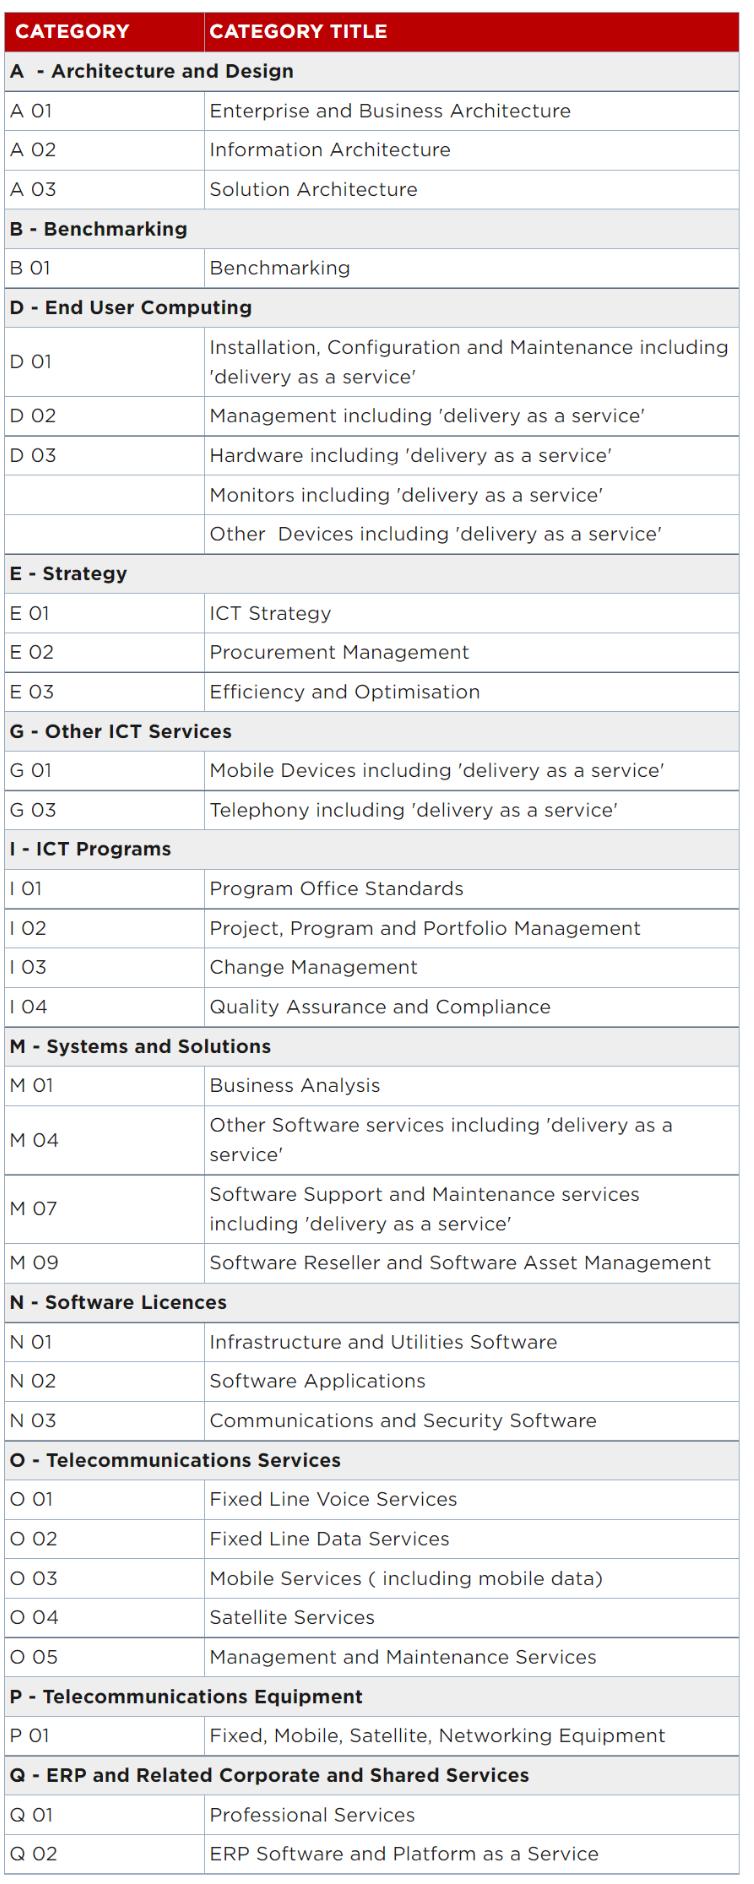 NSW Government ICT Services Scheme 0020 categories